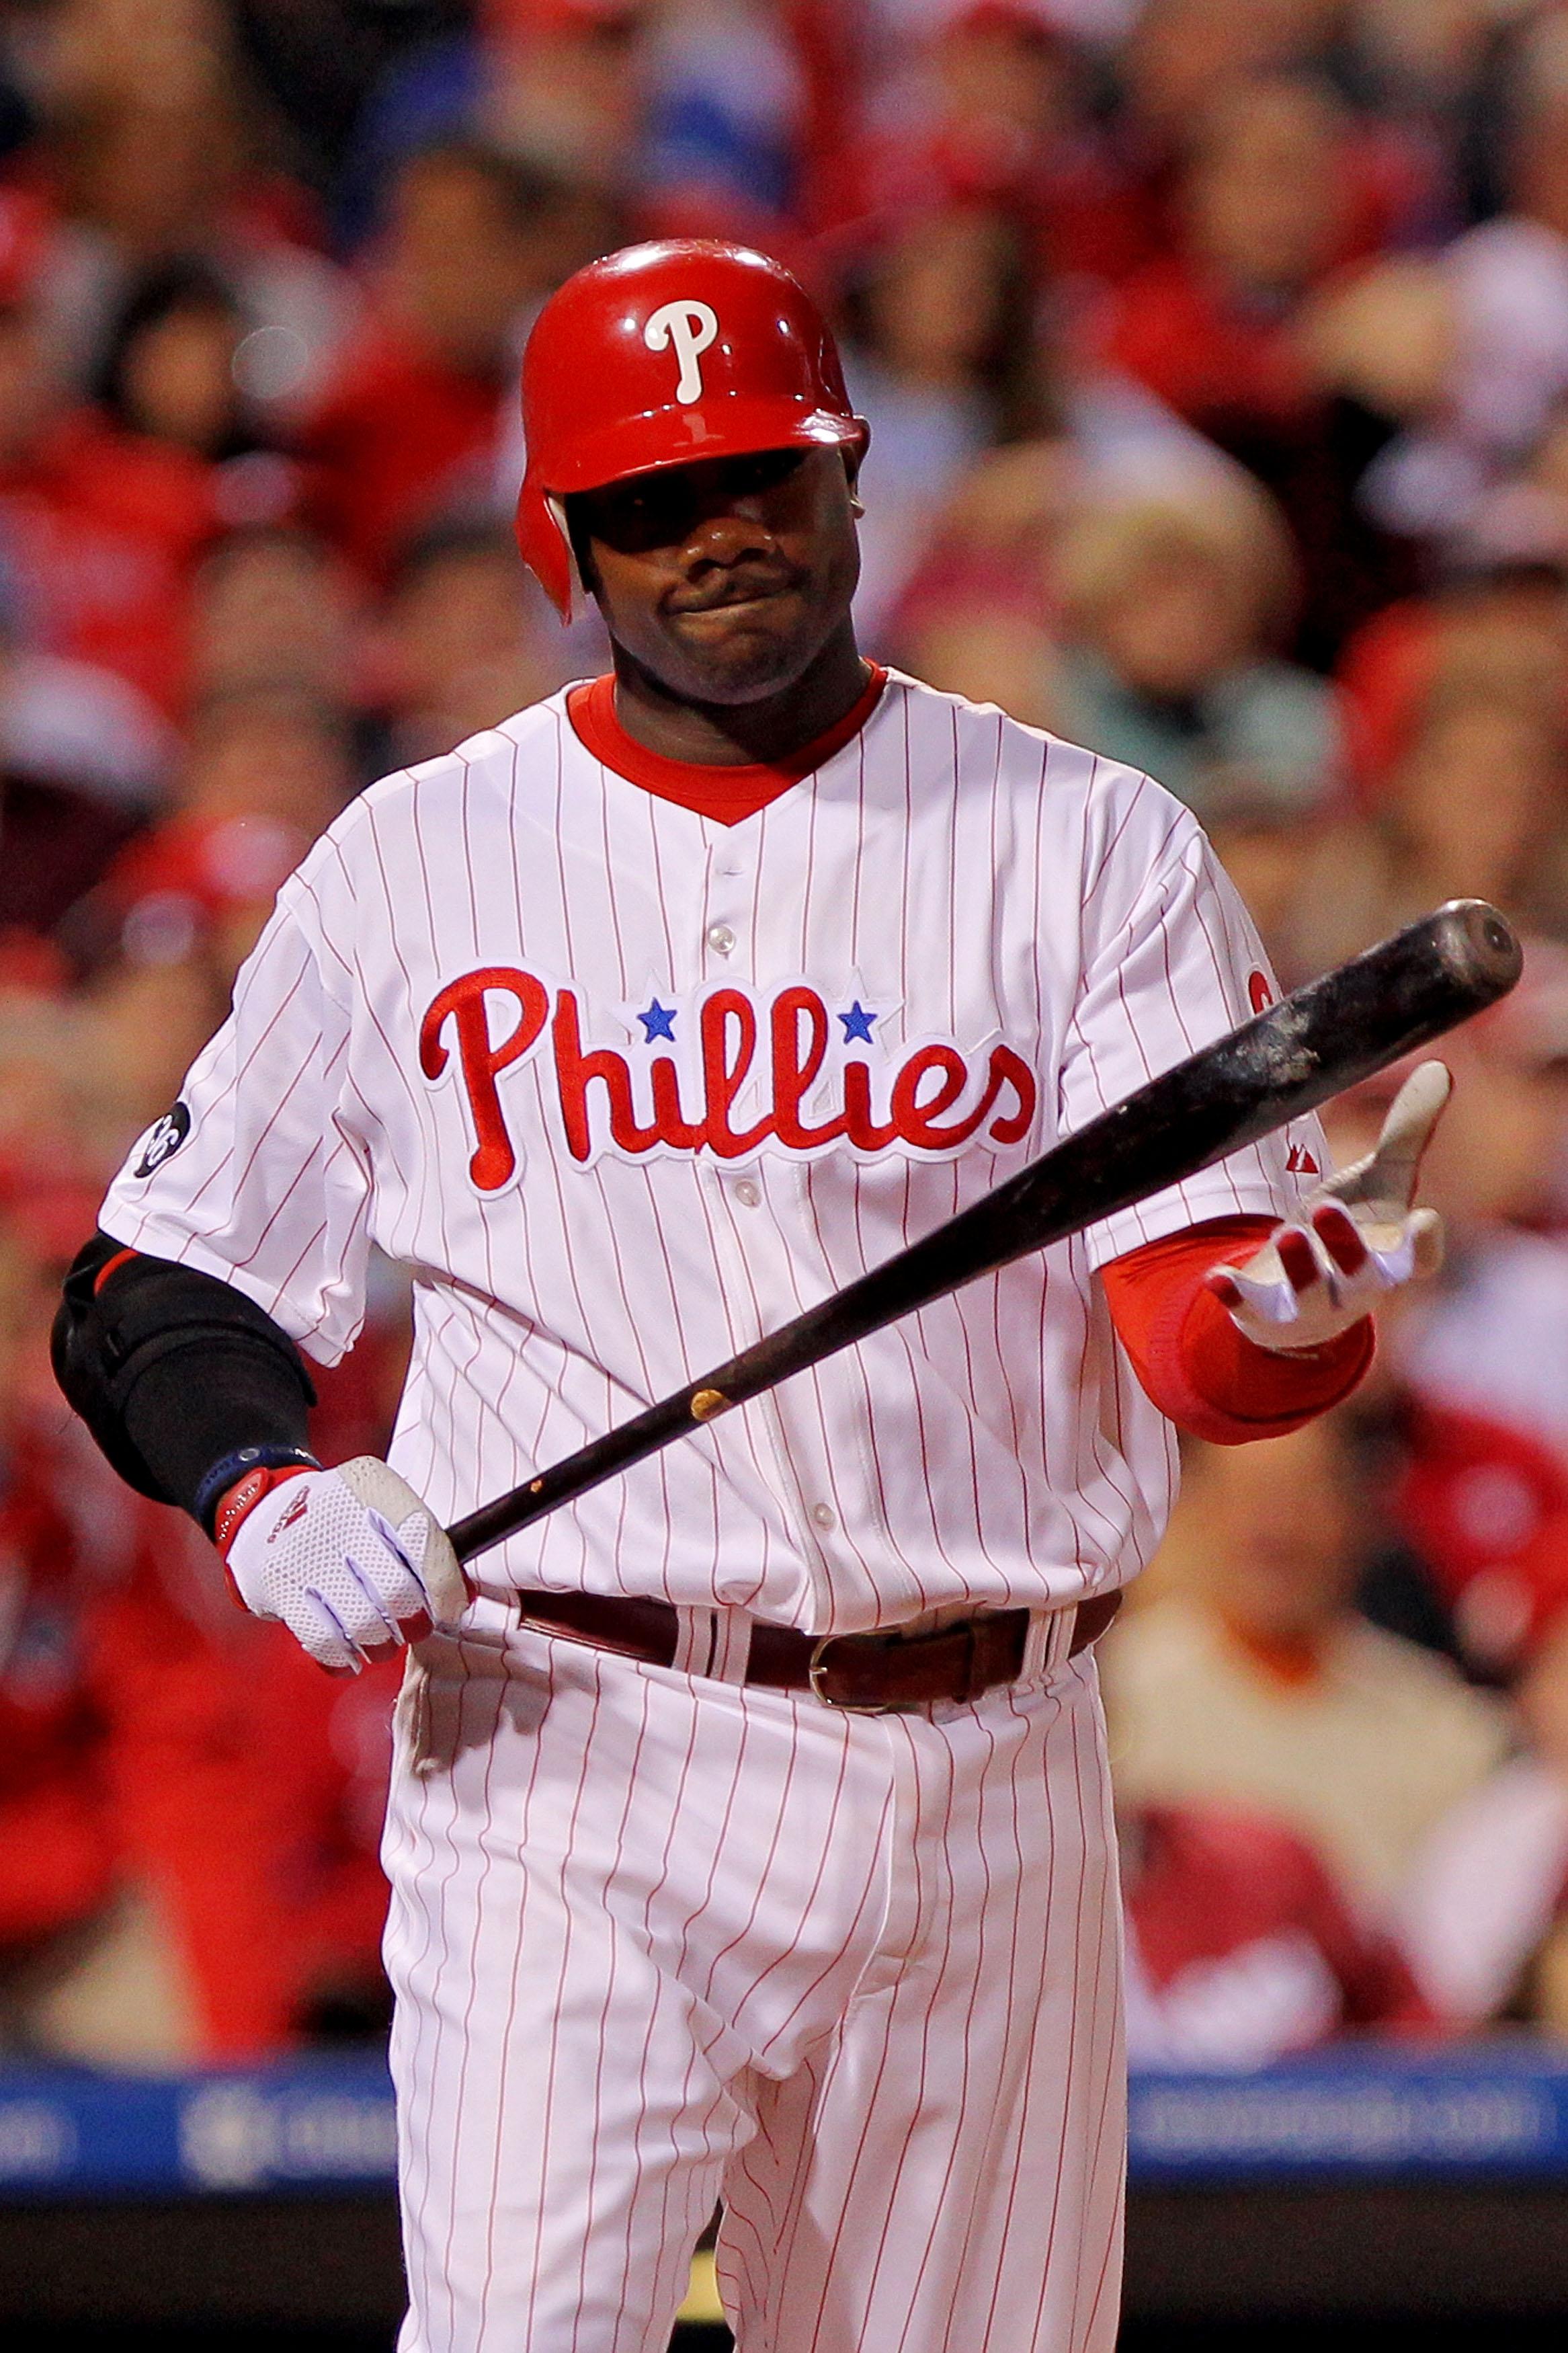 Philadelphia's own 125 Million Dollar Man